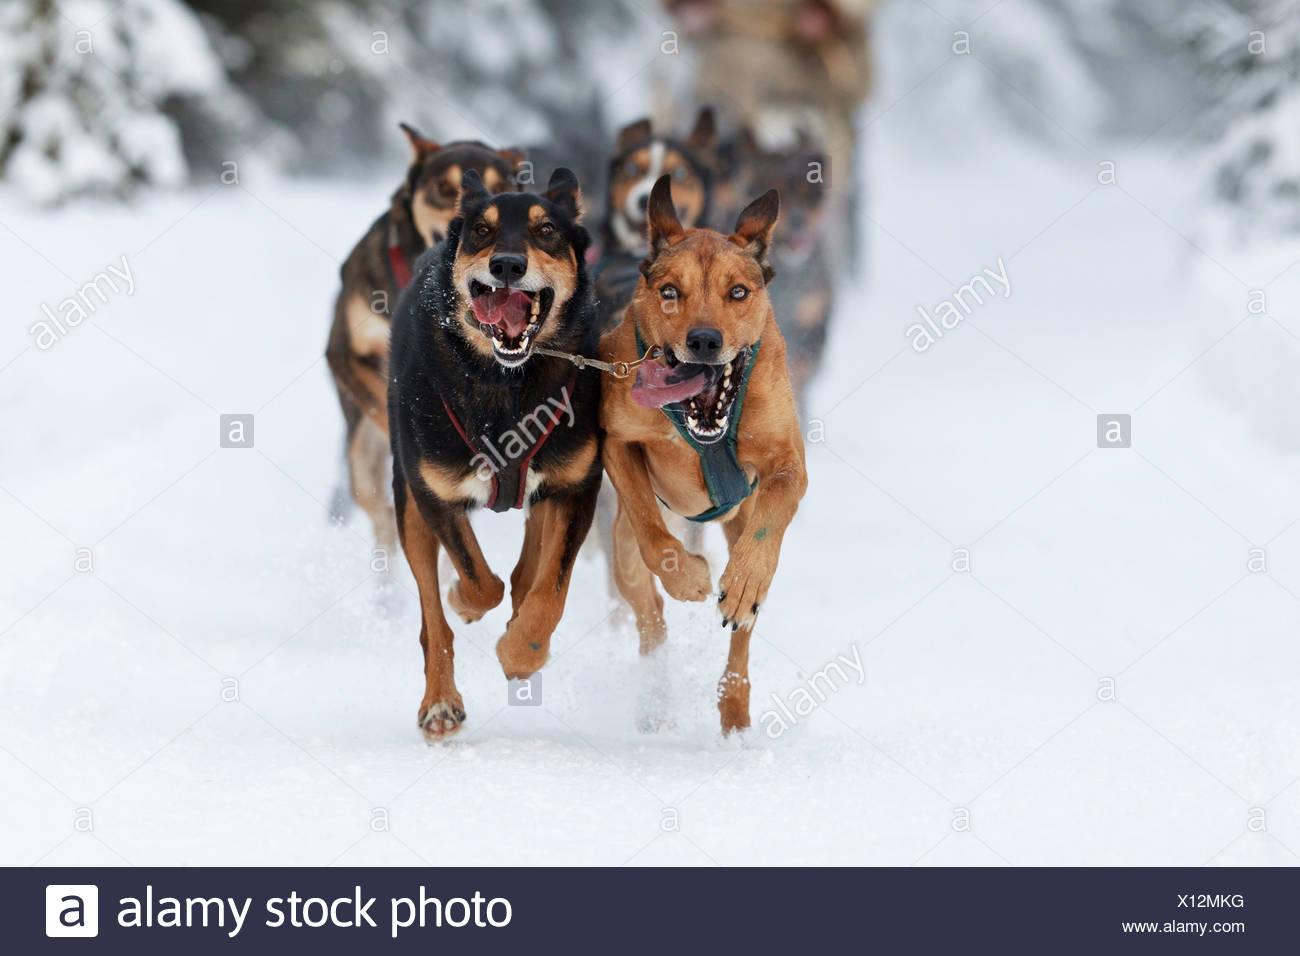 Marvin Kokrine's dogs running in the 2011 ExxonMobil Open, Southcentral Alaska, Winter - Stock Image